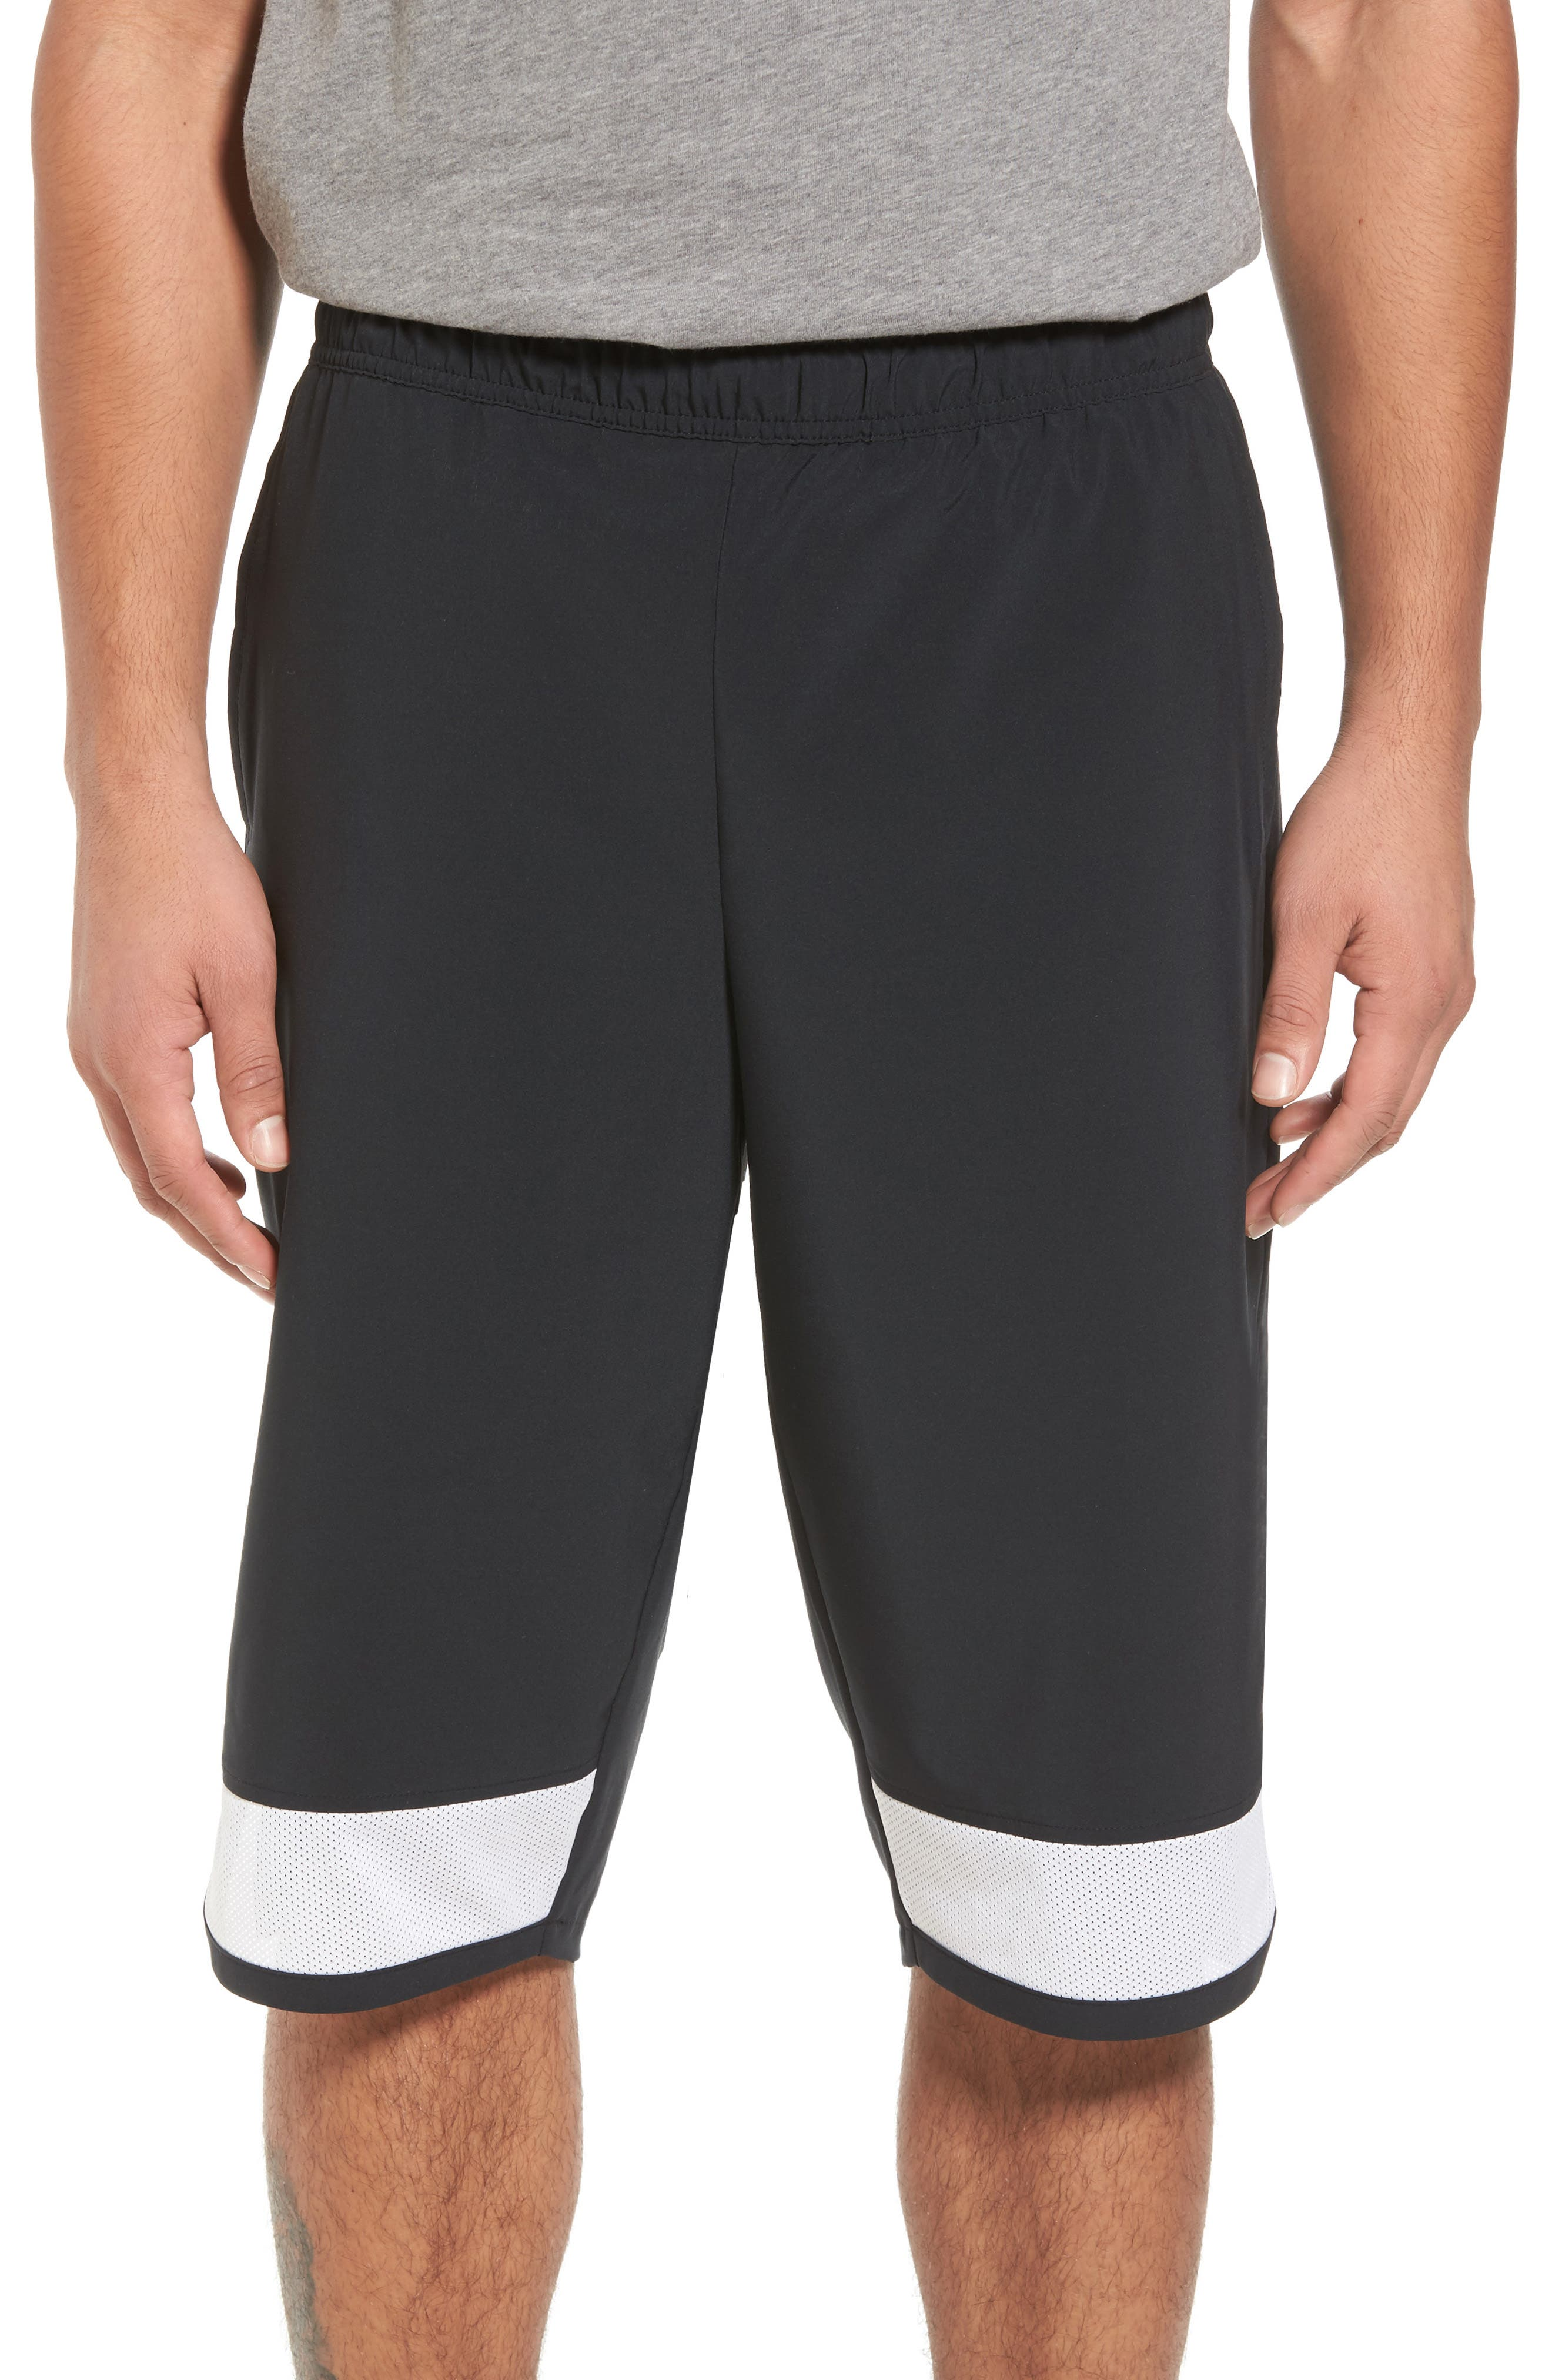 Training Flex PX Shorts,                         Main,                         color, BLACK/ WHITE/ WHITE